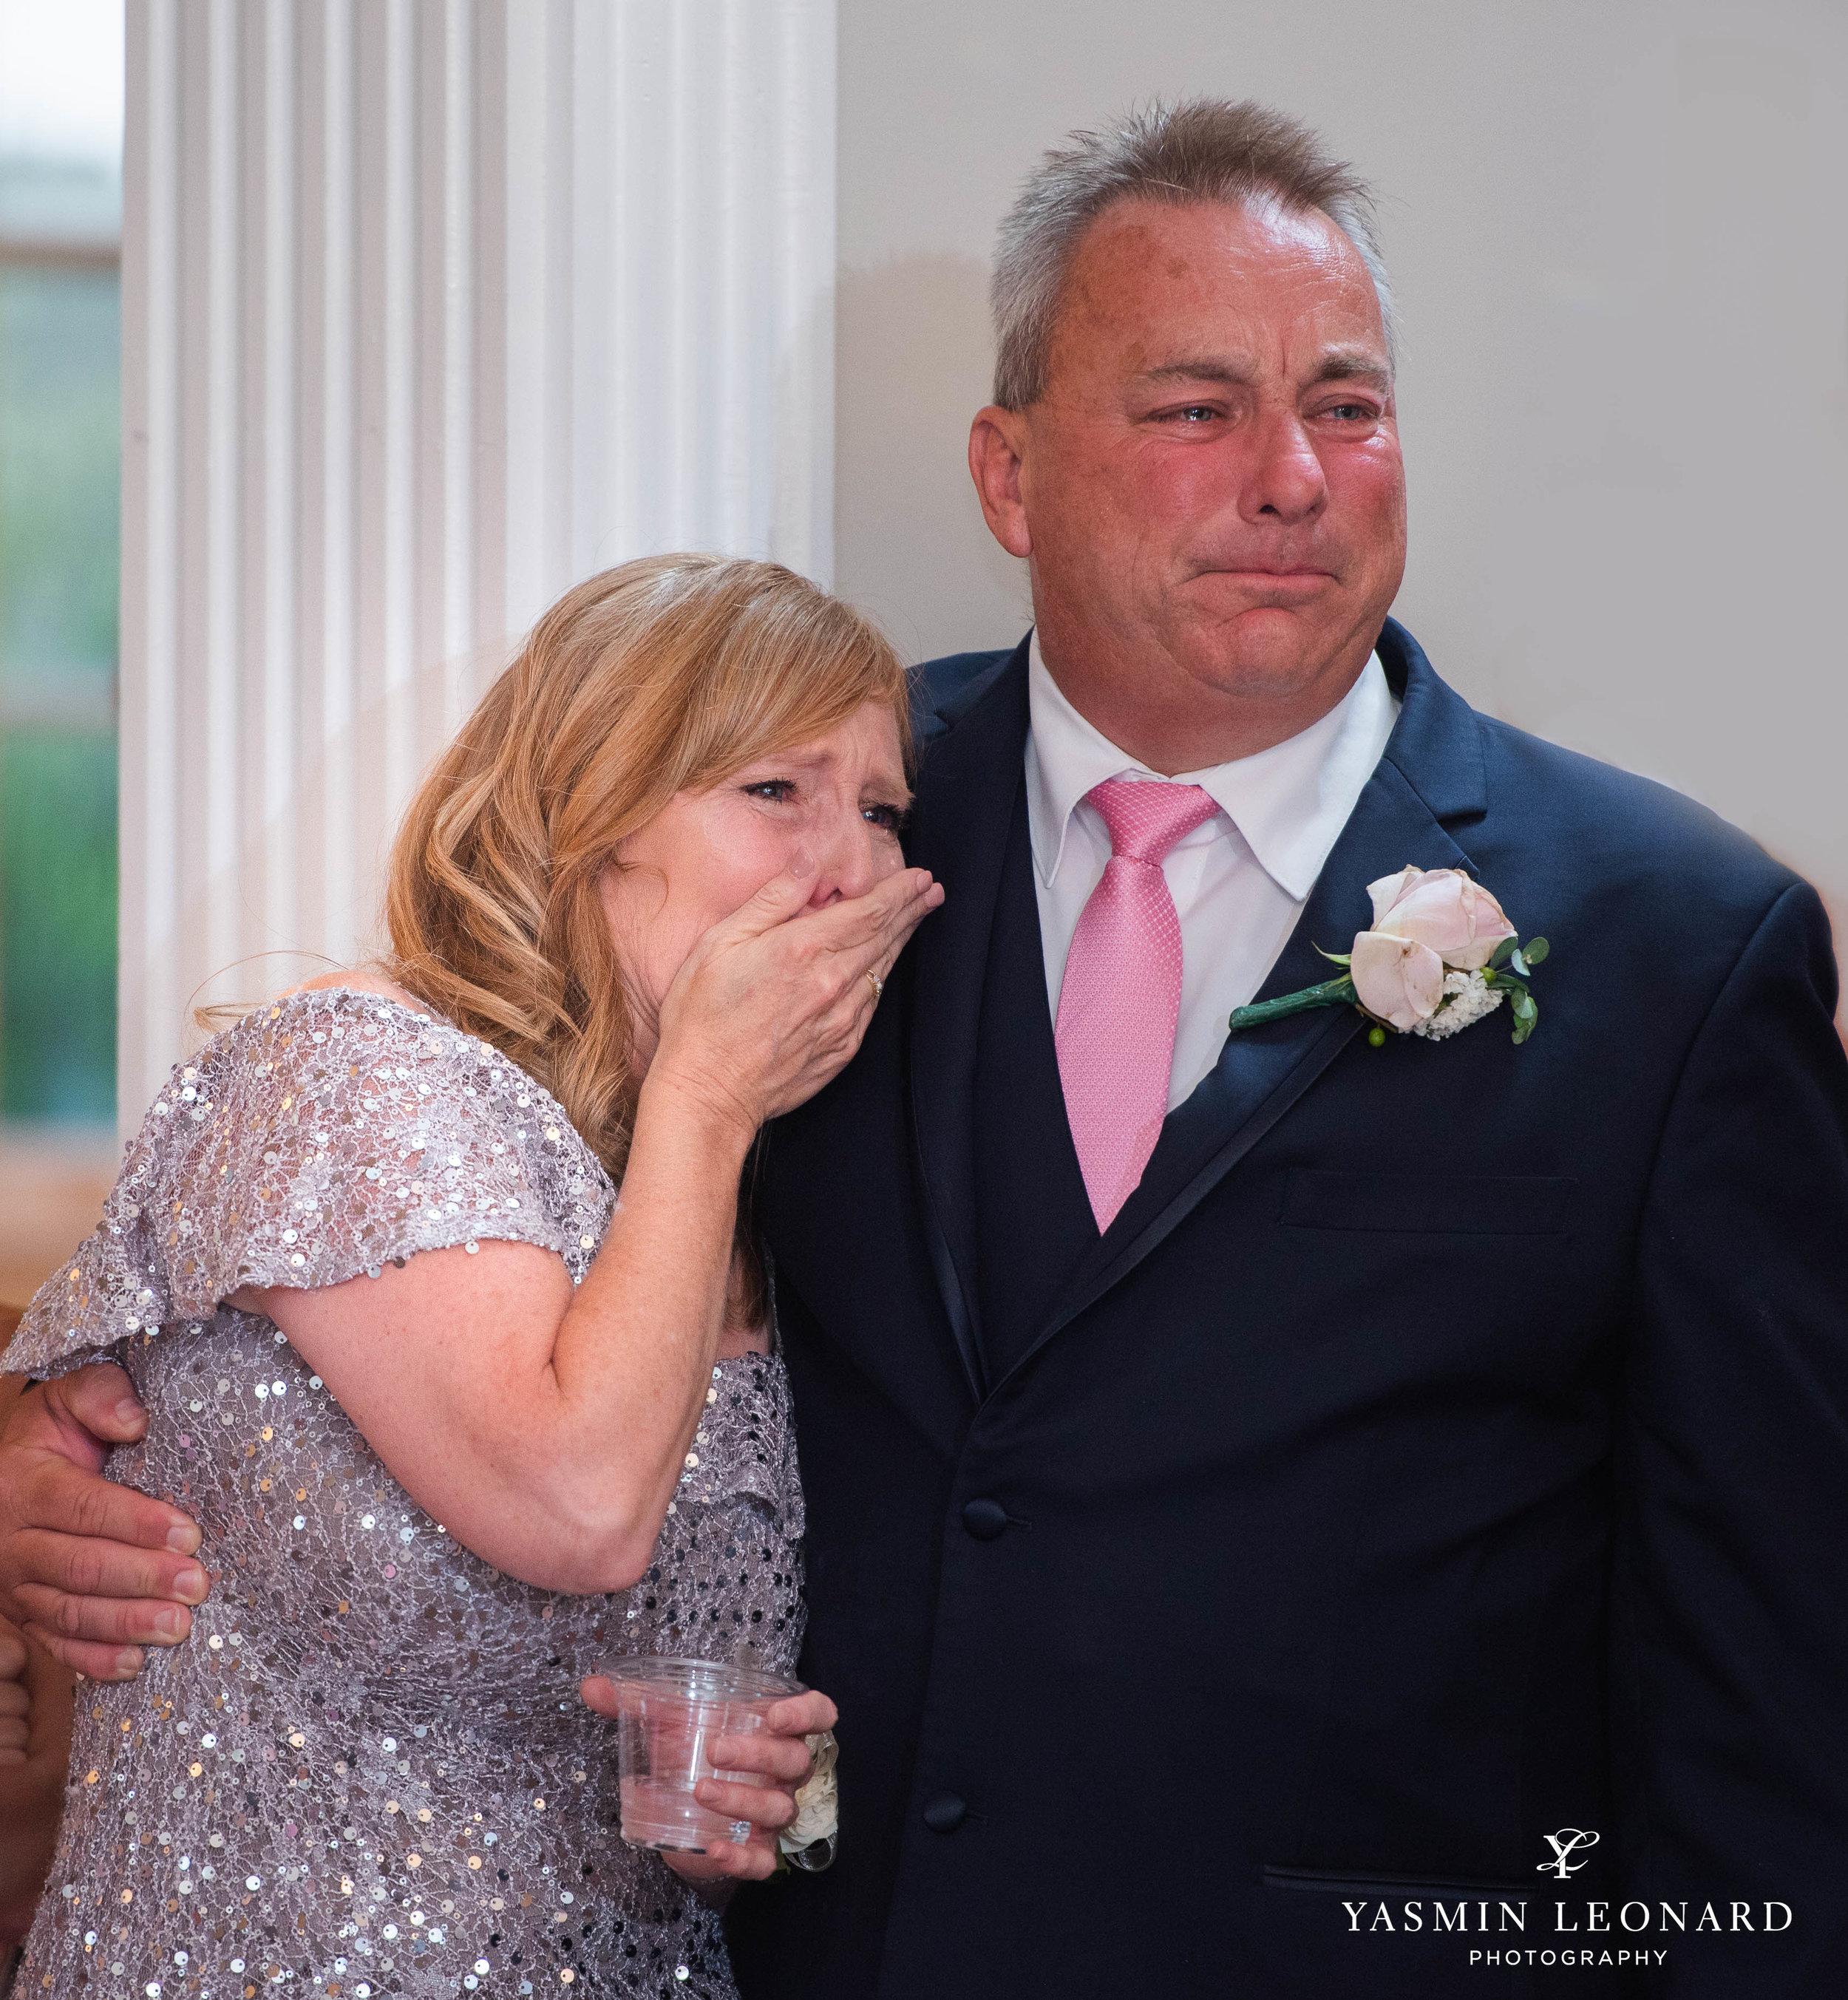 Separk Mansion - NC Weddings - Gastonia Wedding - NC Wedding Venues - Pink and Blue Wedding Ideas - Pink Bridesmaid Dresses - Yasmin Leonard Photography-52.jpg